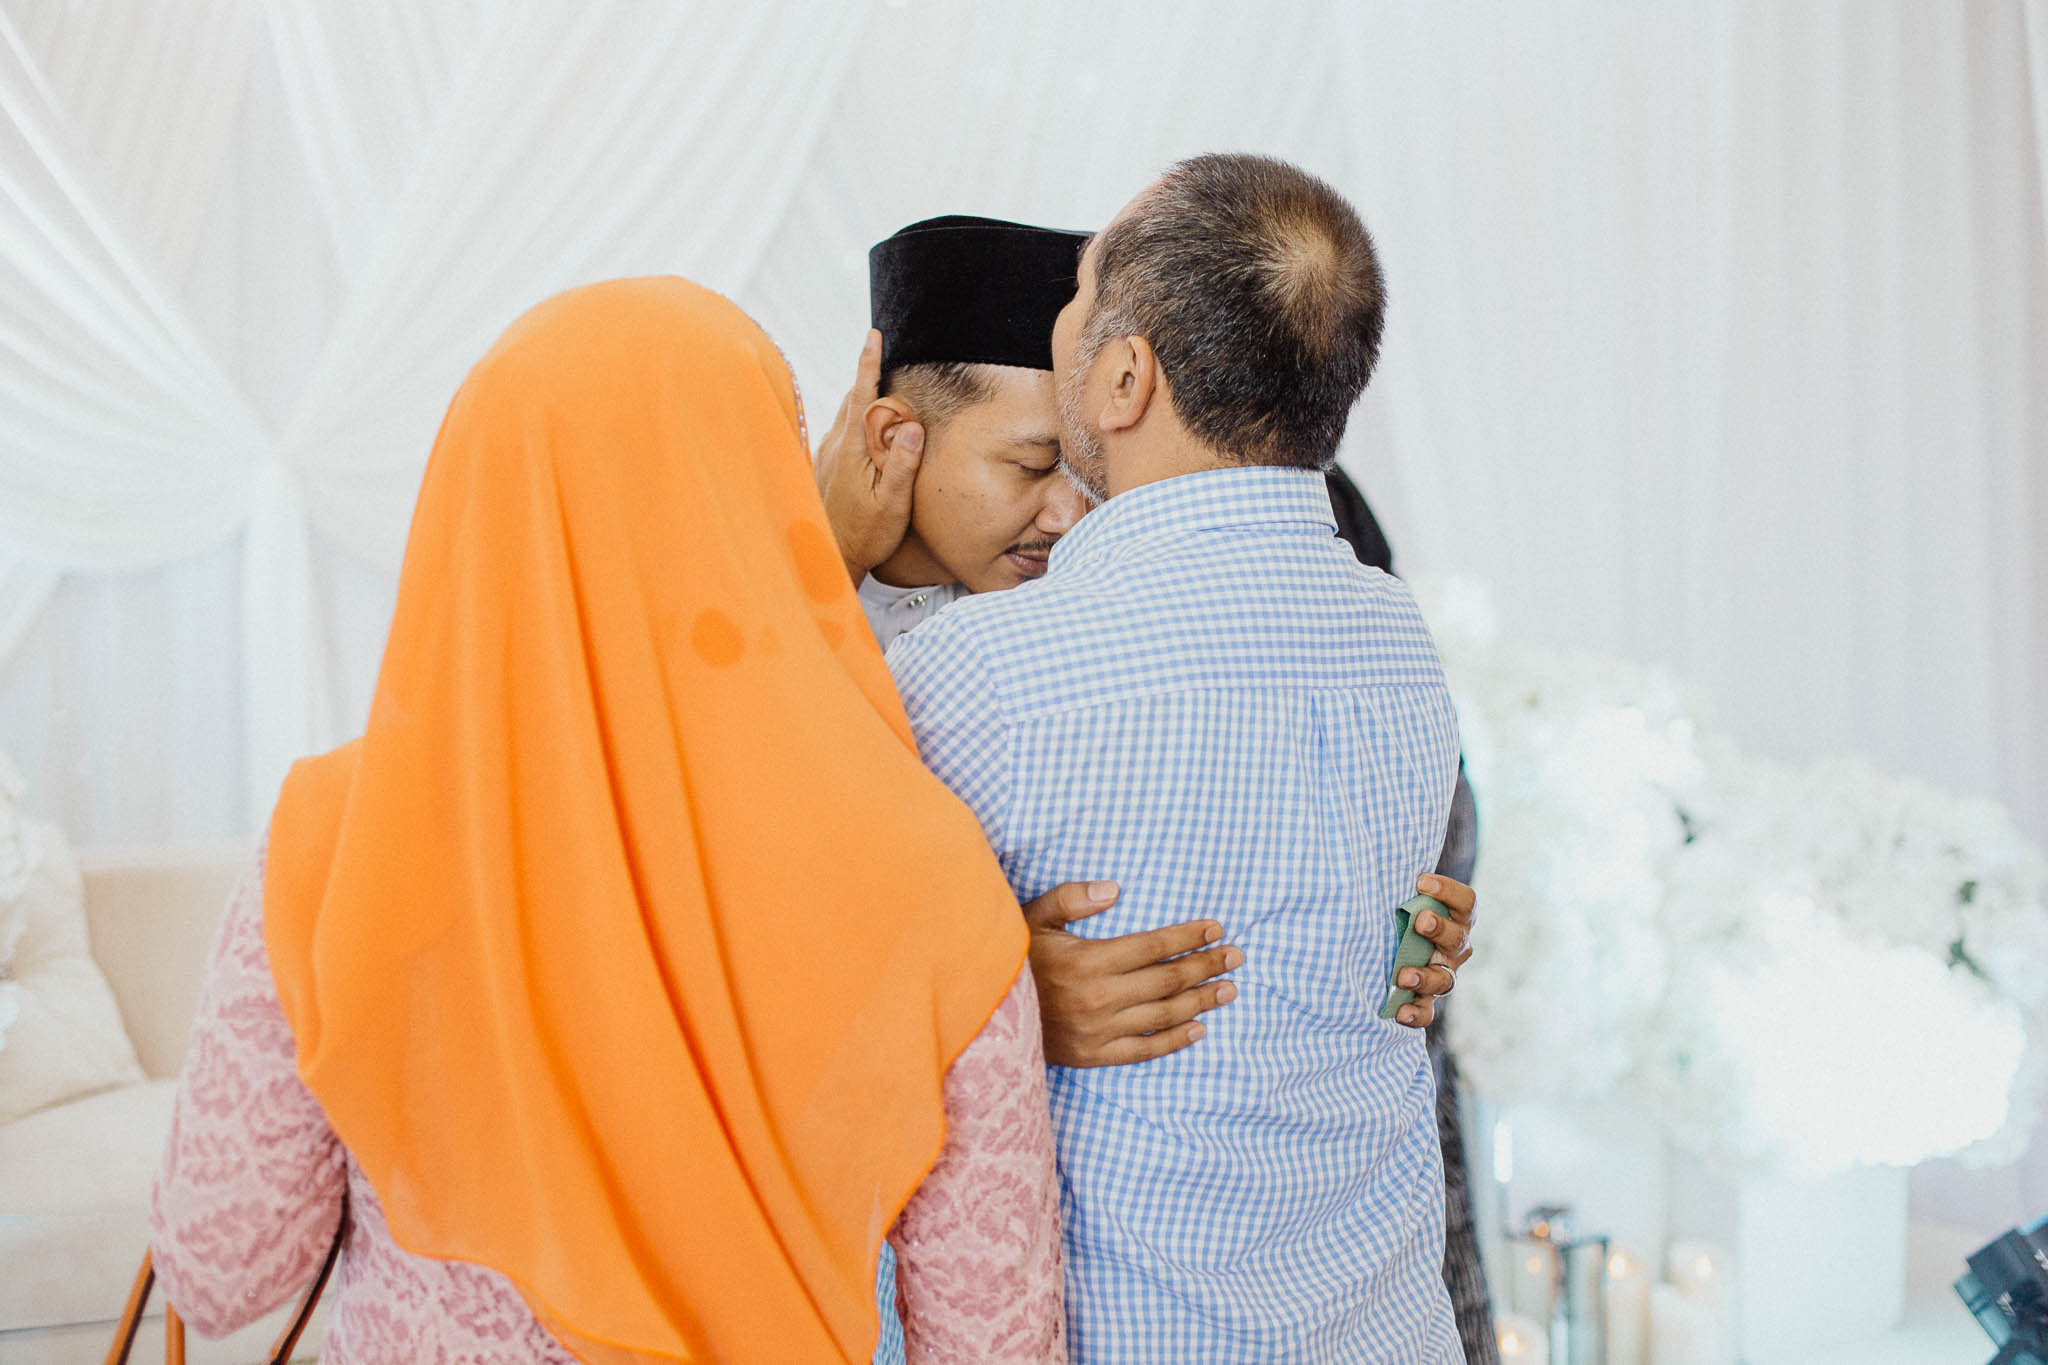 singapore-wedding-photographer-addafiq-nufail-036.jpg